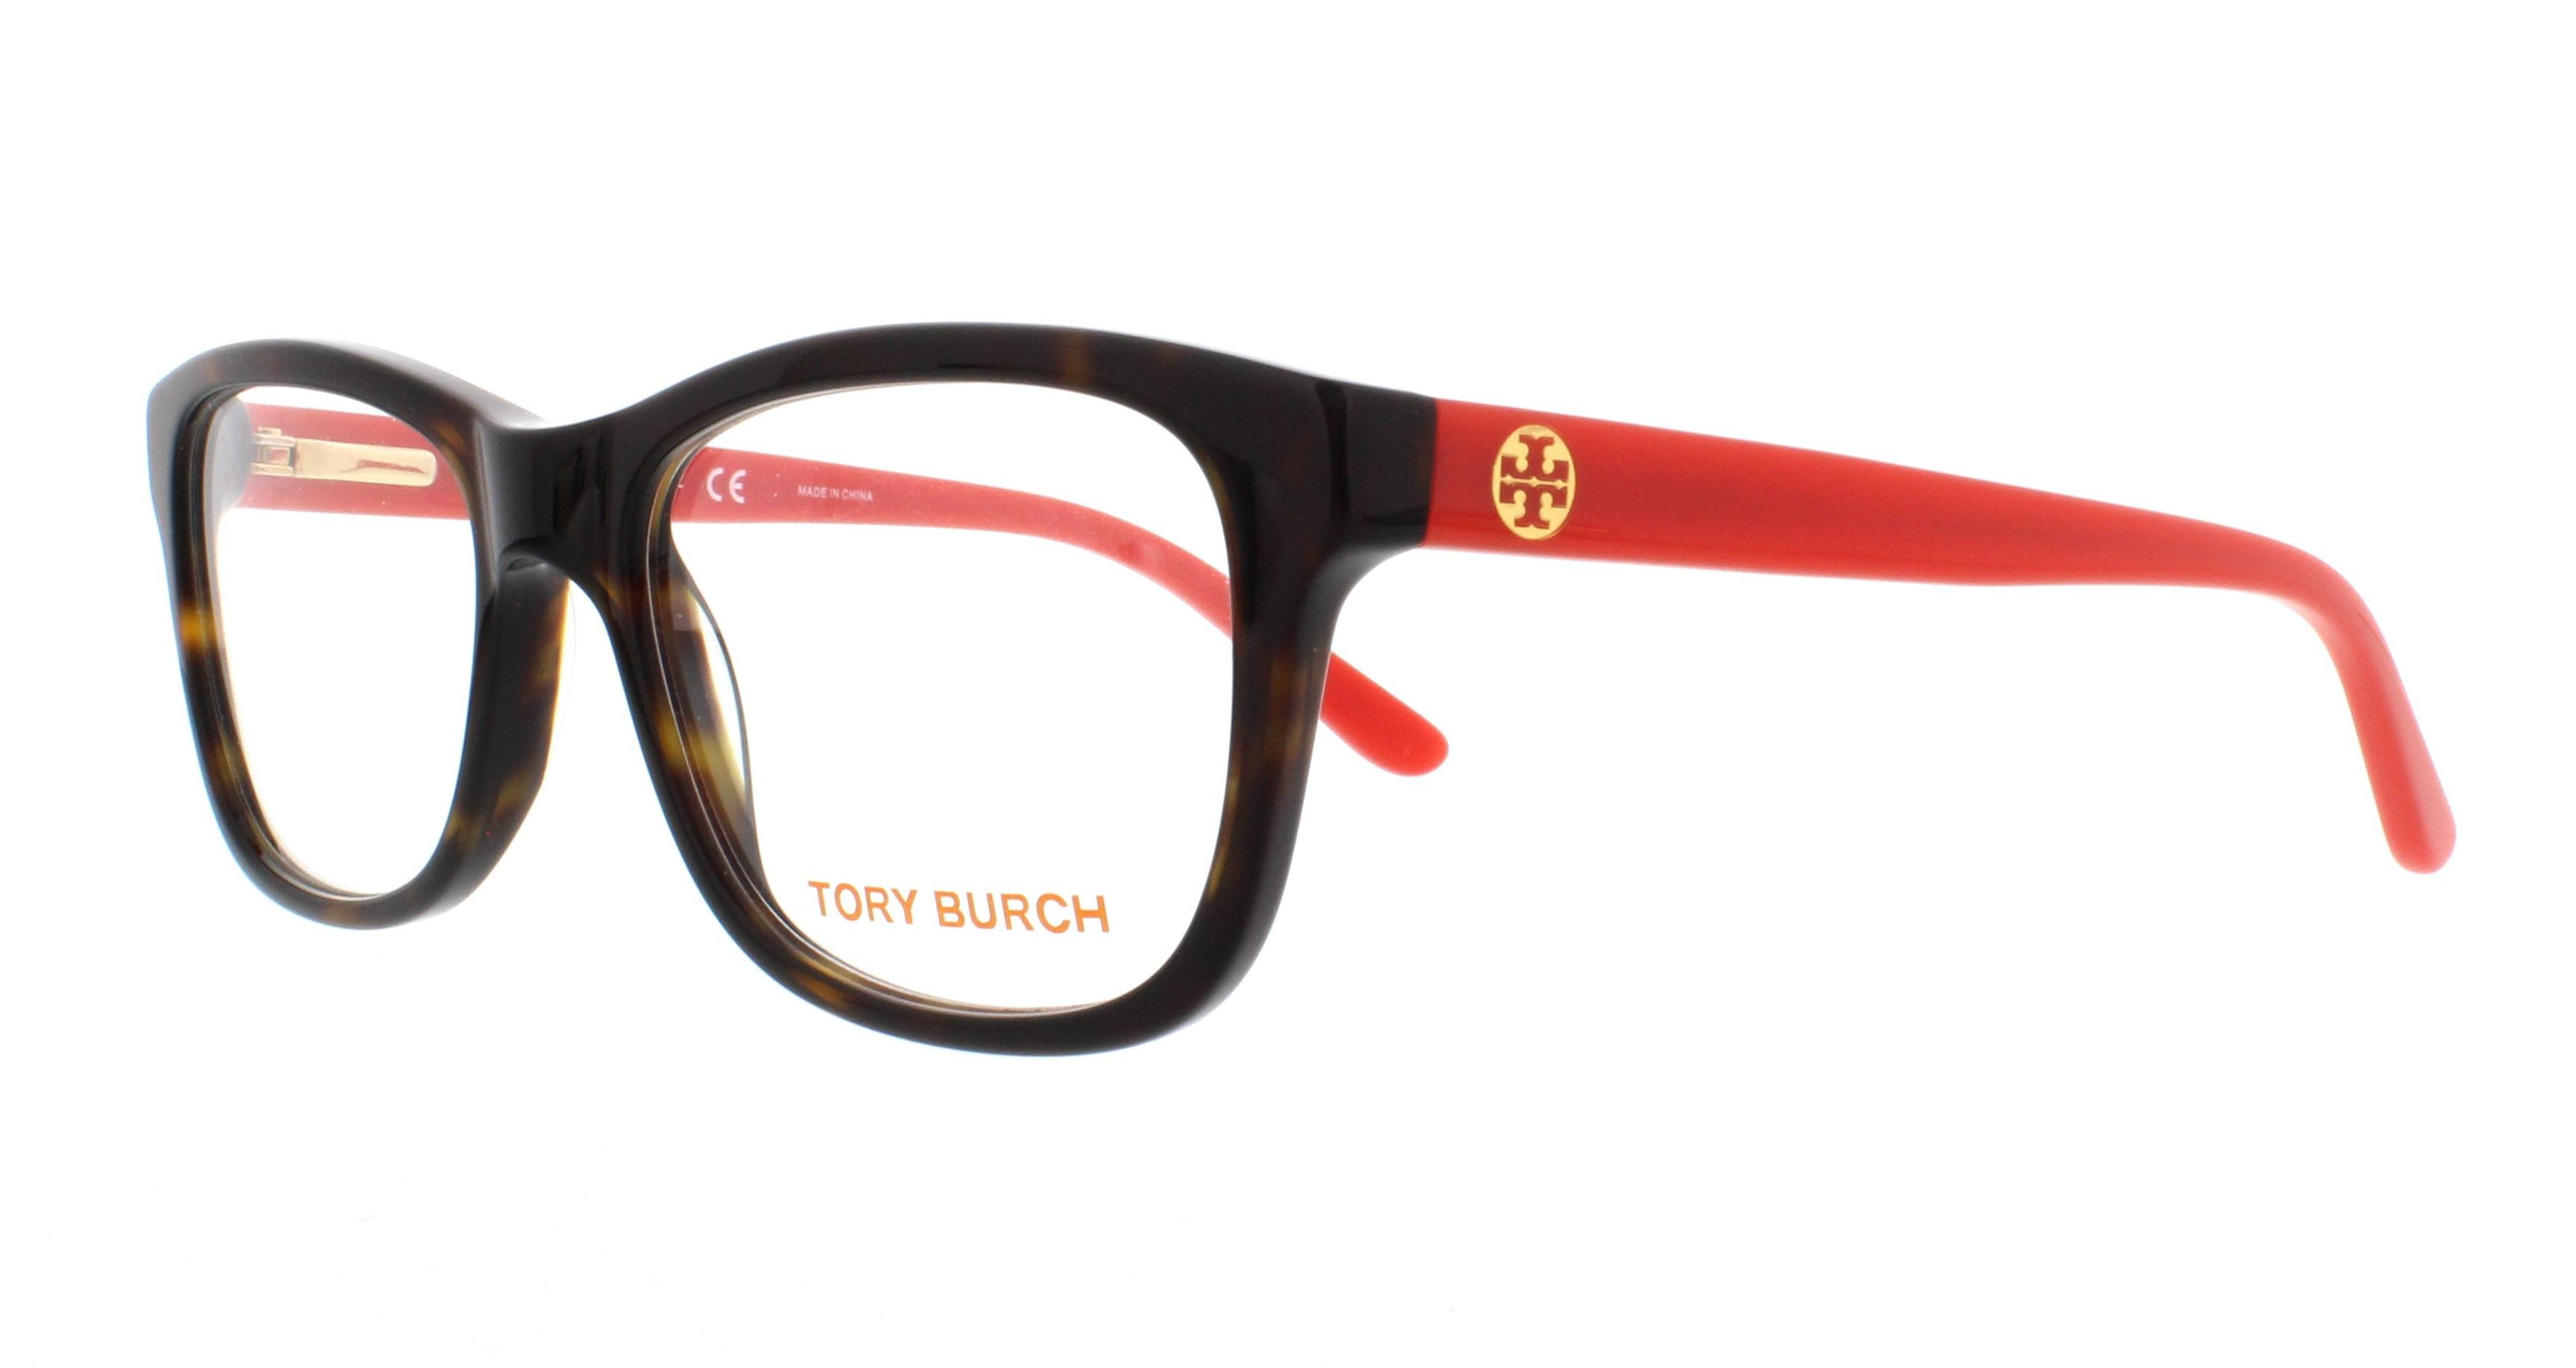 8cbecd0bc8 TORY BURCH Eyeglasses TY 2038 1213 Tortoise Pink 52MM - Walmart.com